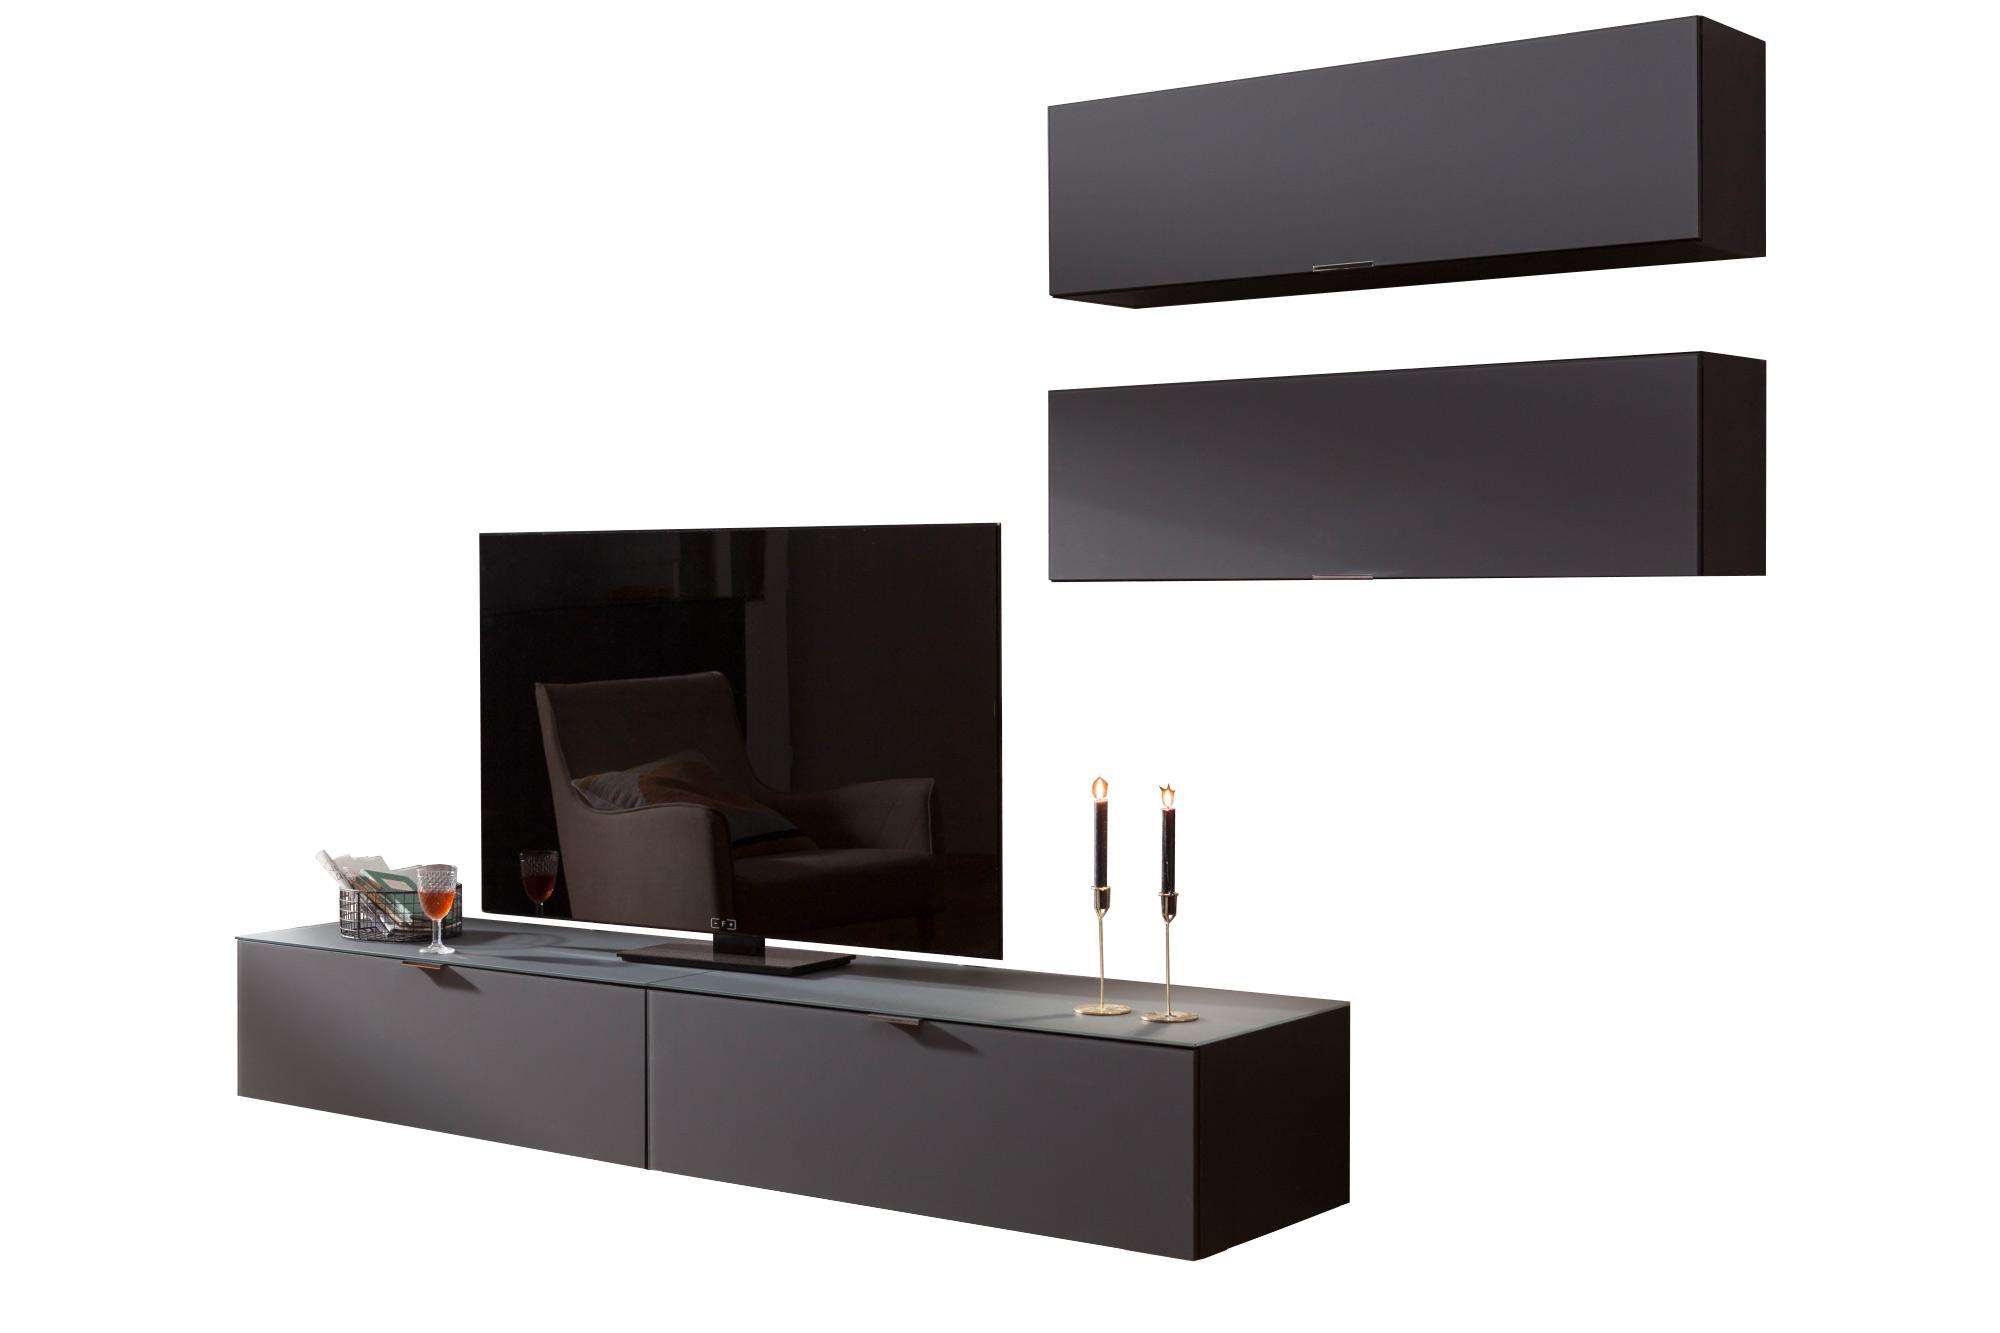 CS Schmalmöbel Wohnwand Cleo Special Edition grau schwarz